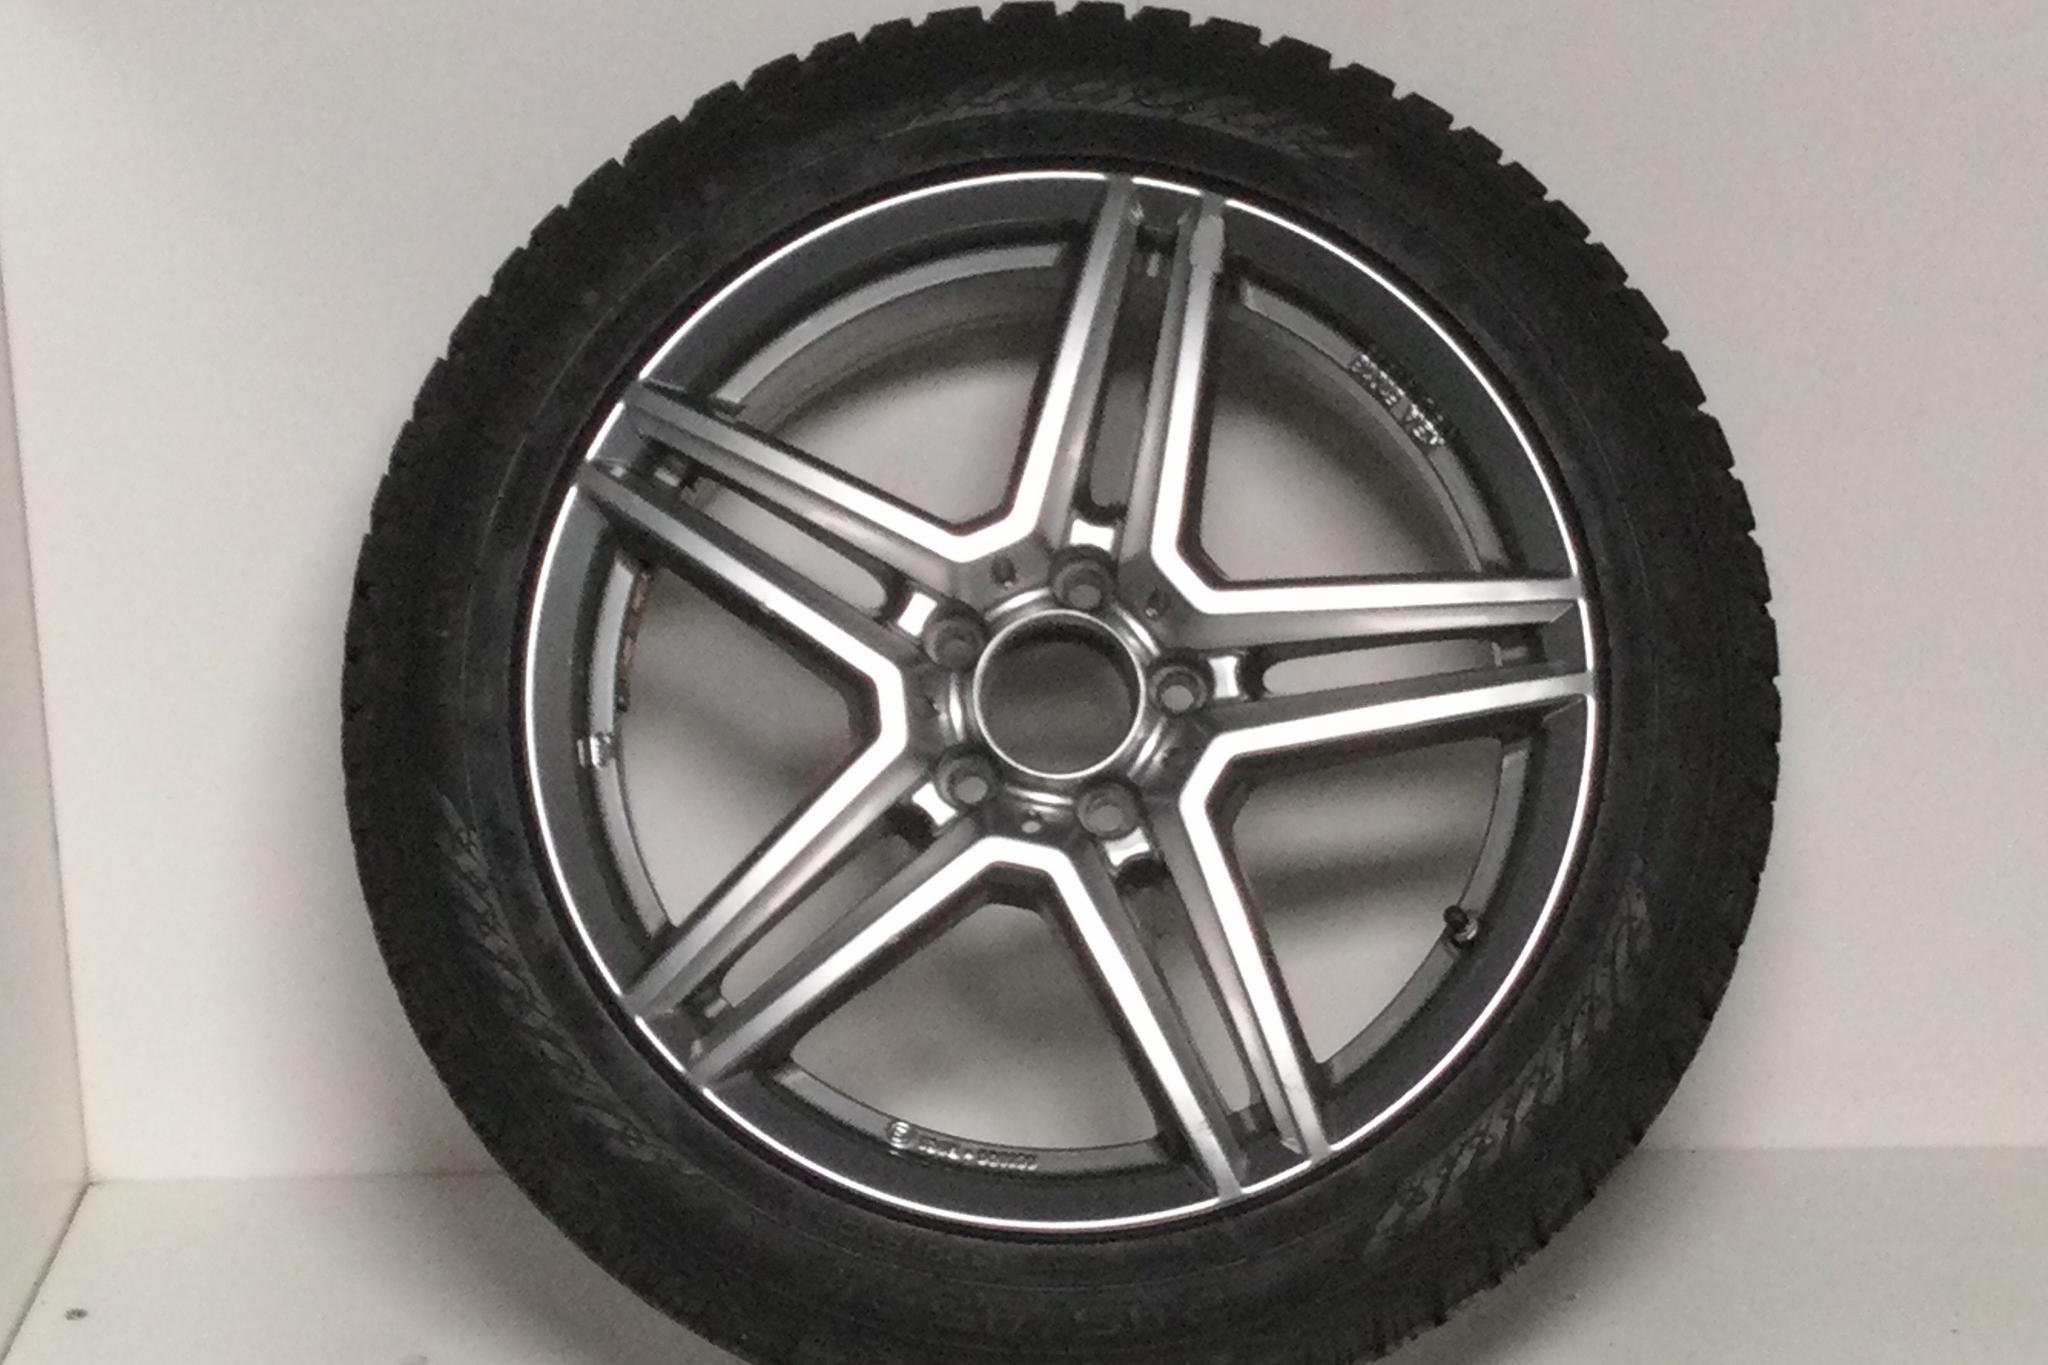 Mercedes E 200 d Kombi S213 (150hk) - 9 501 mil - Automat - svart - 2018